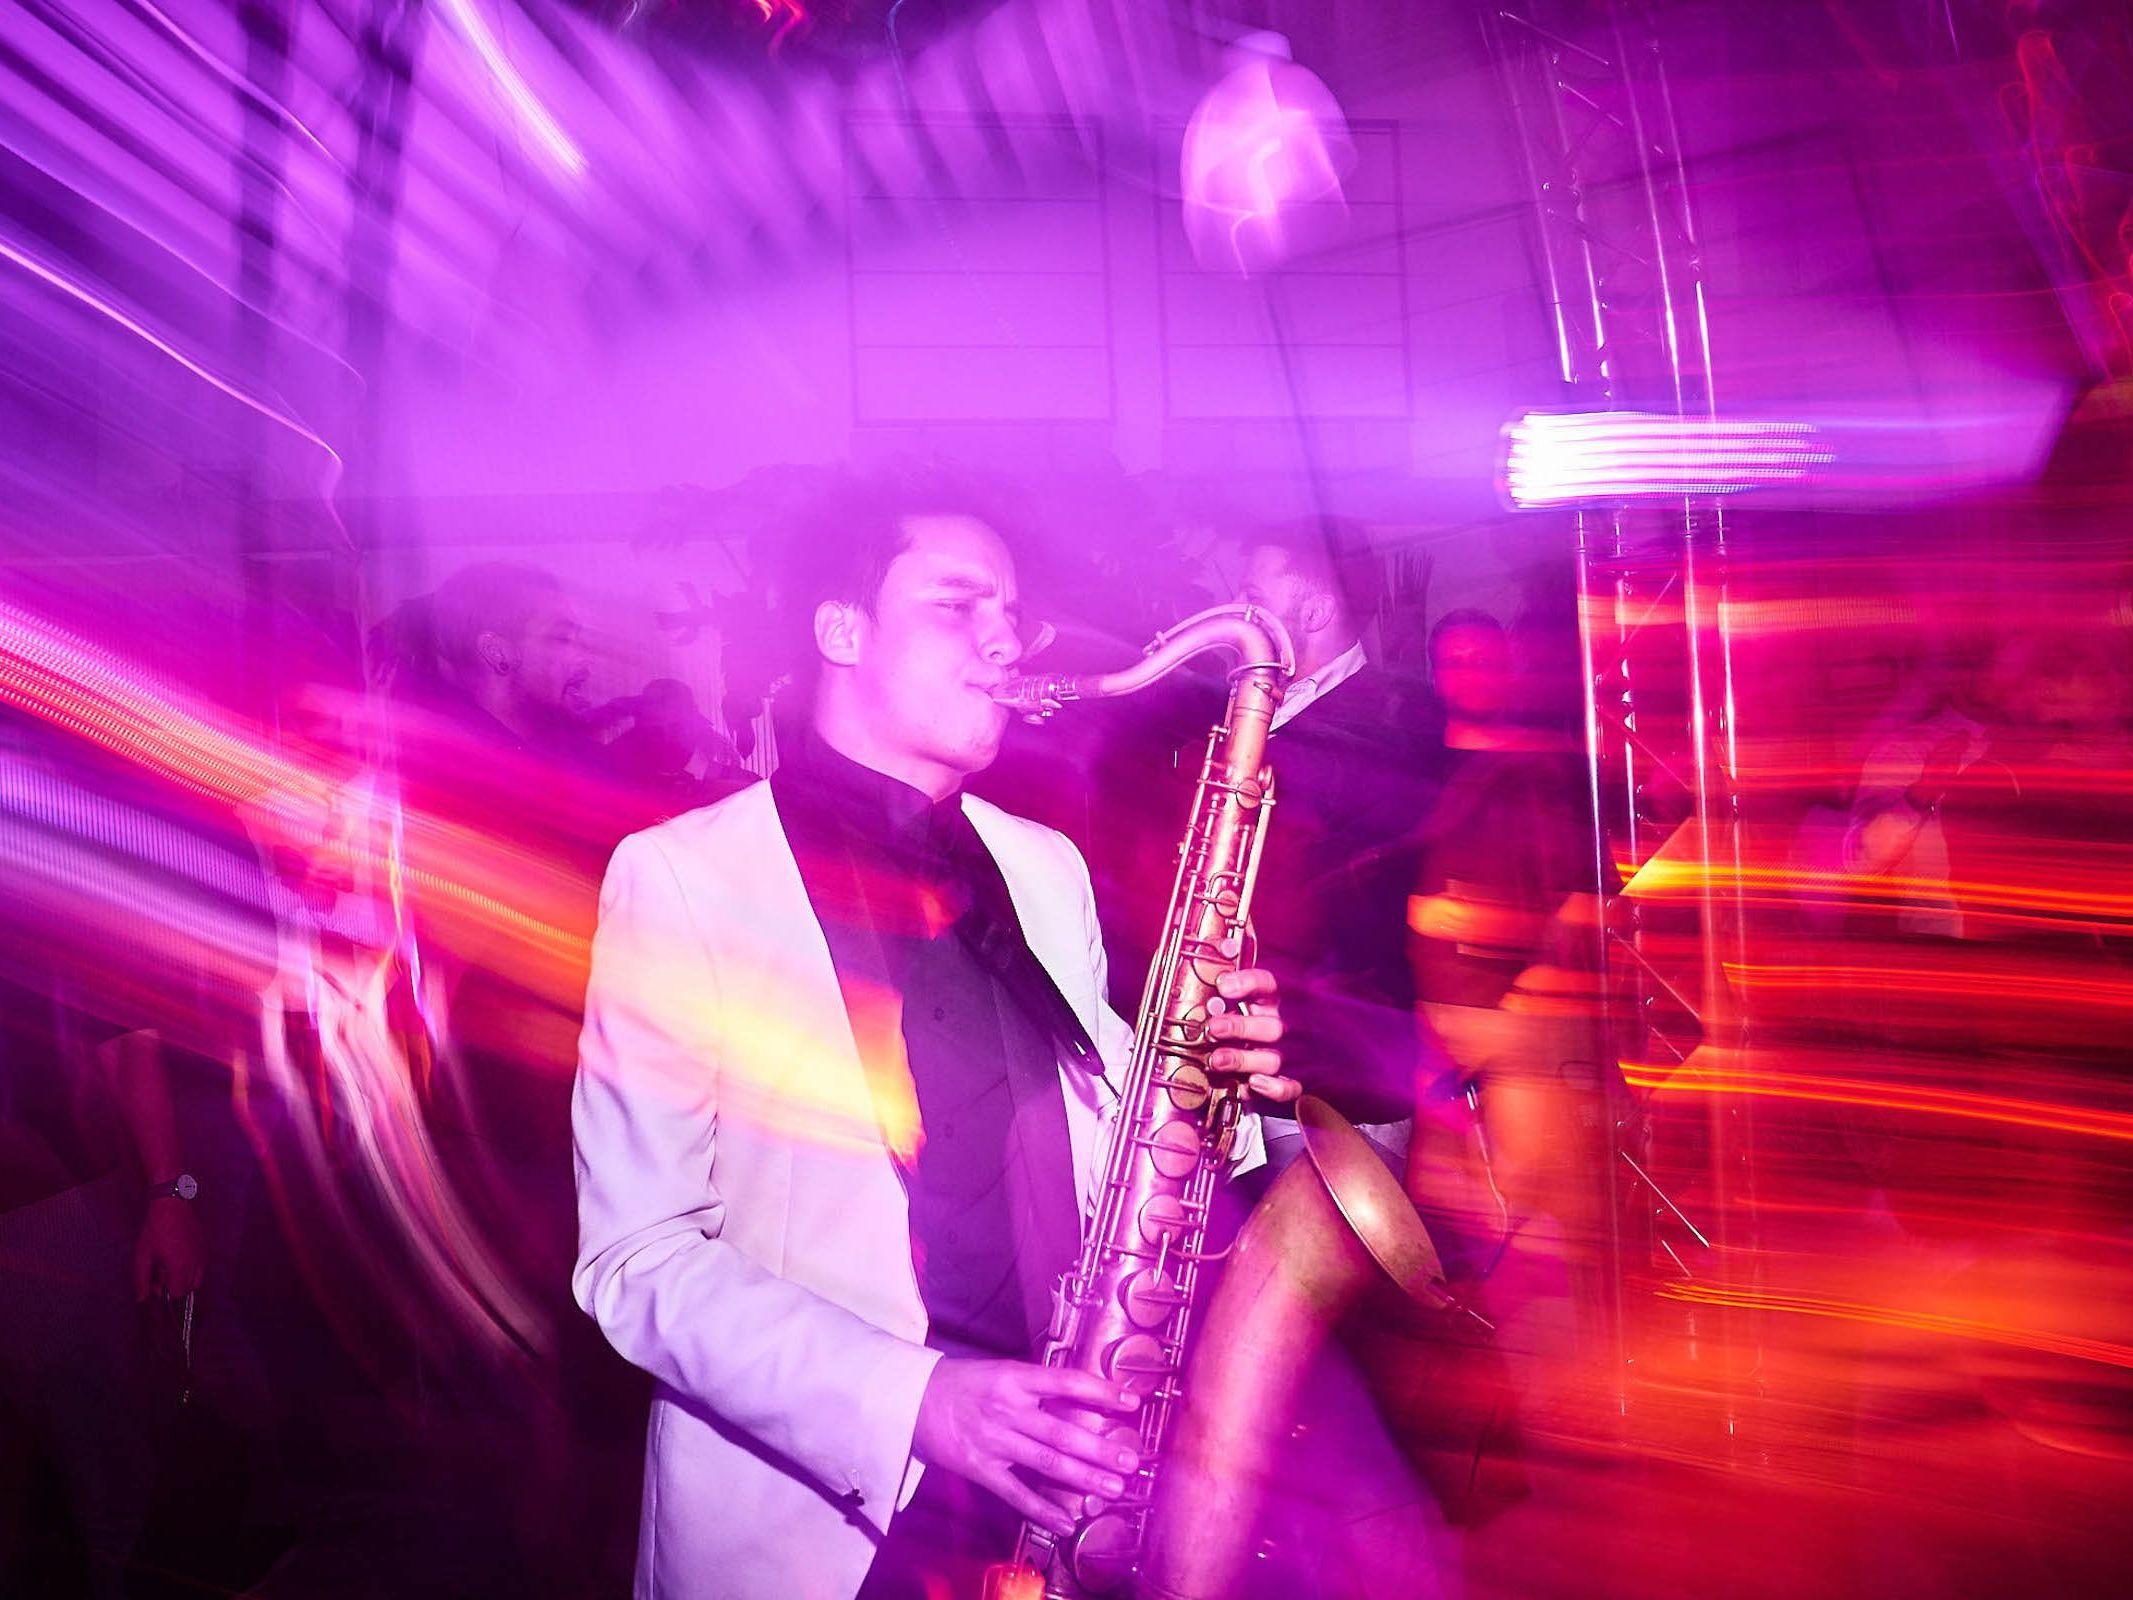 Saxophonist | Hochzeit | Sommerfest | Hochzeit | Gala | Firmenfeier | Saxophon | Buchen | Empfang | Party | Buchen | Livemusik | House | Electro | Pop | Party | Event | Empfang | Messe | Mieten